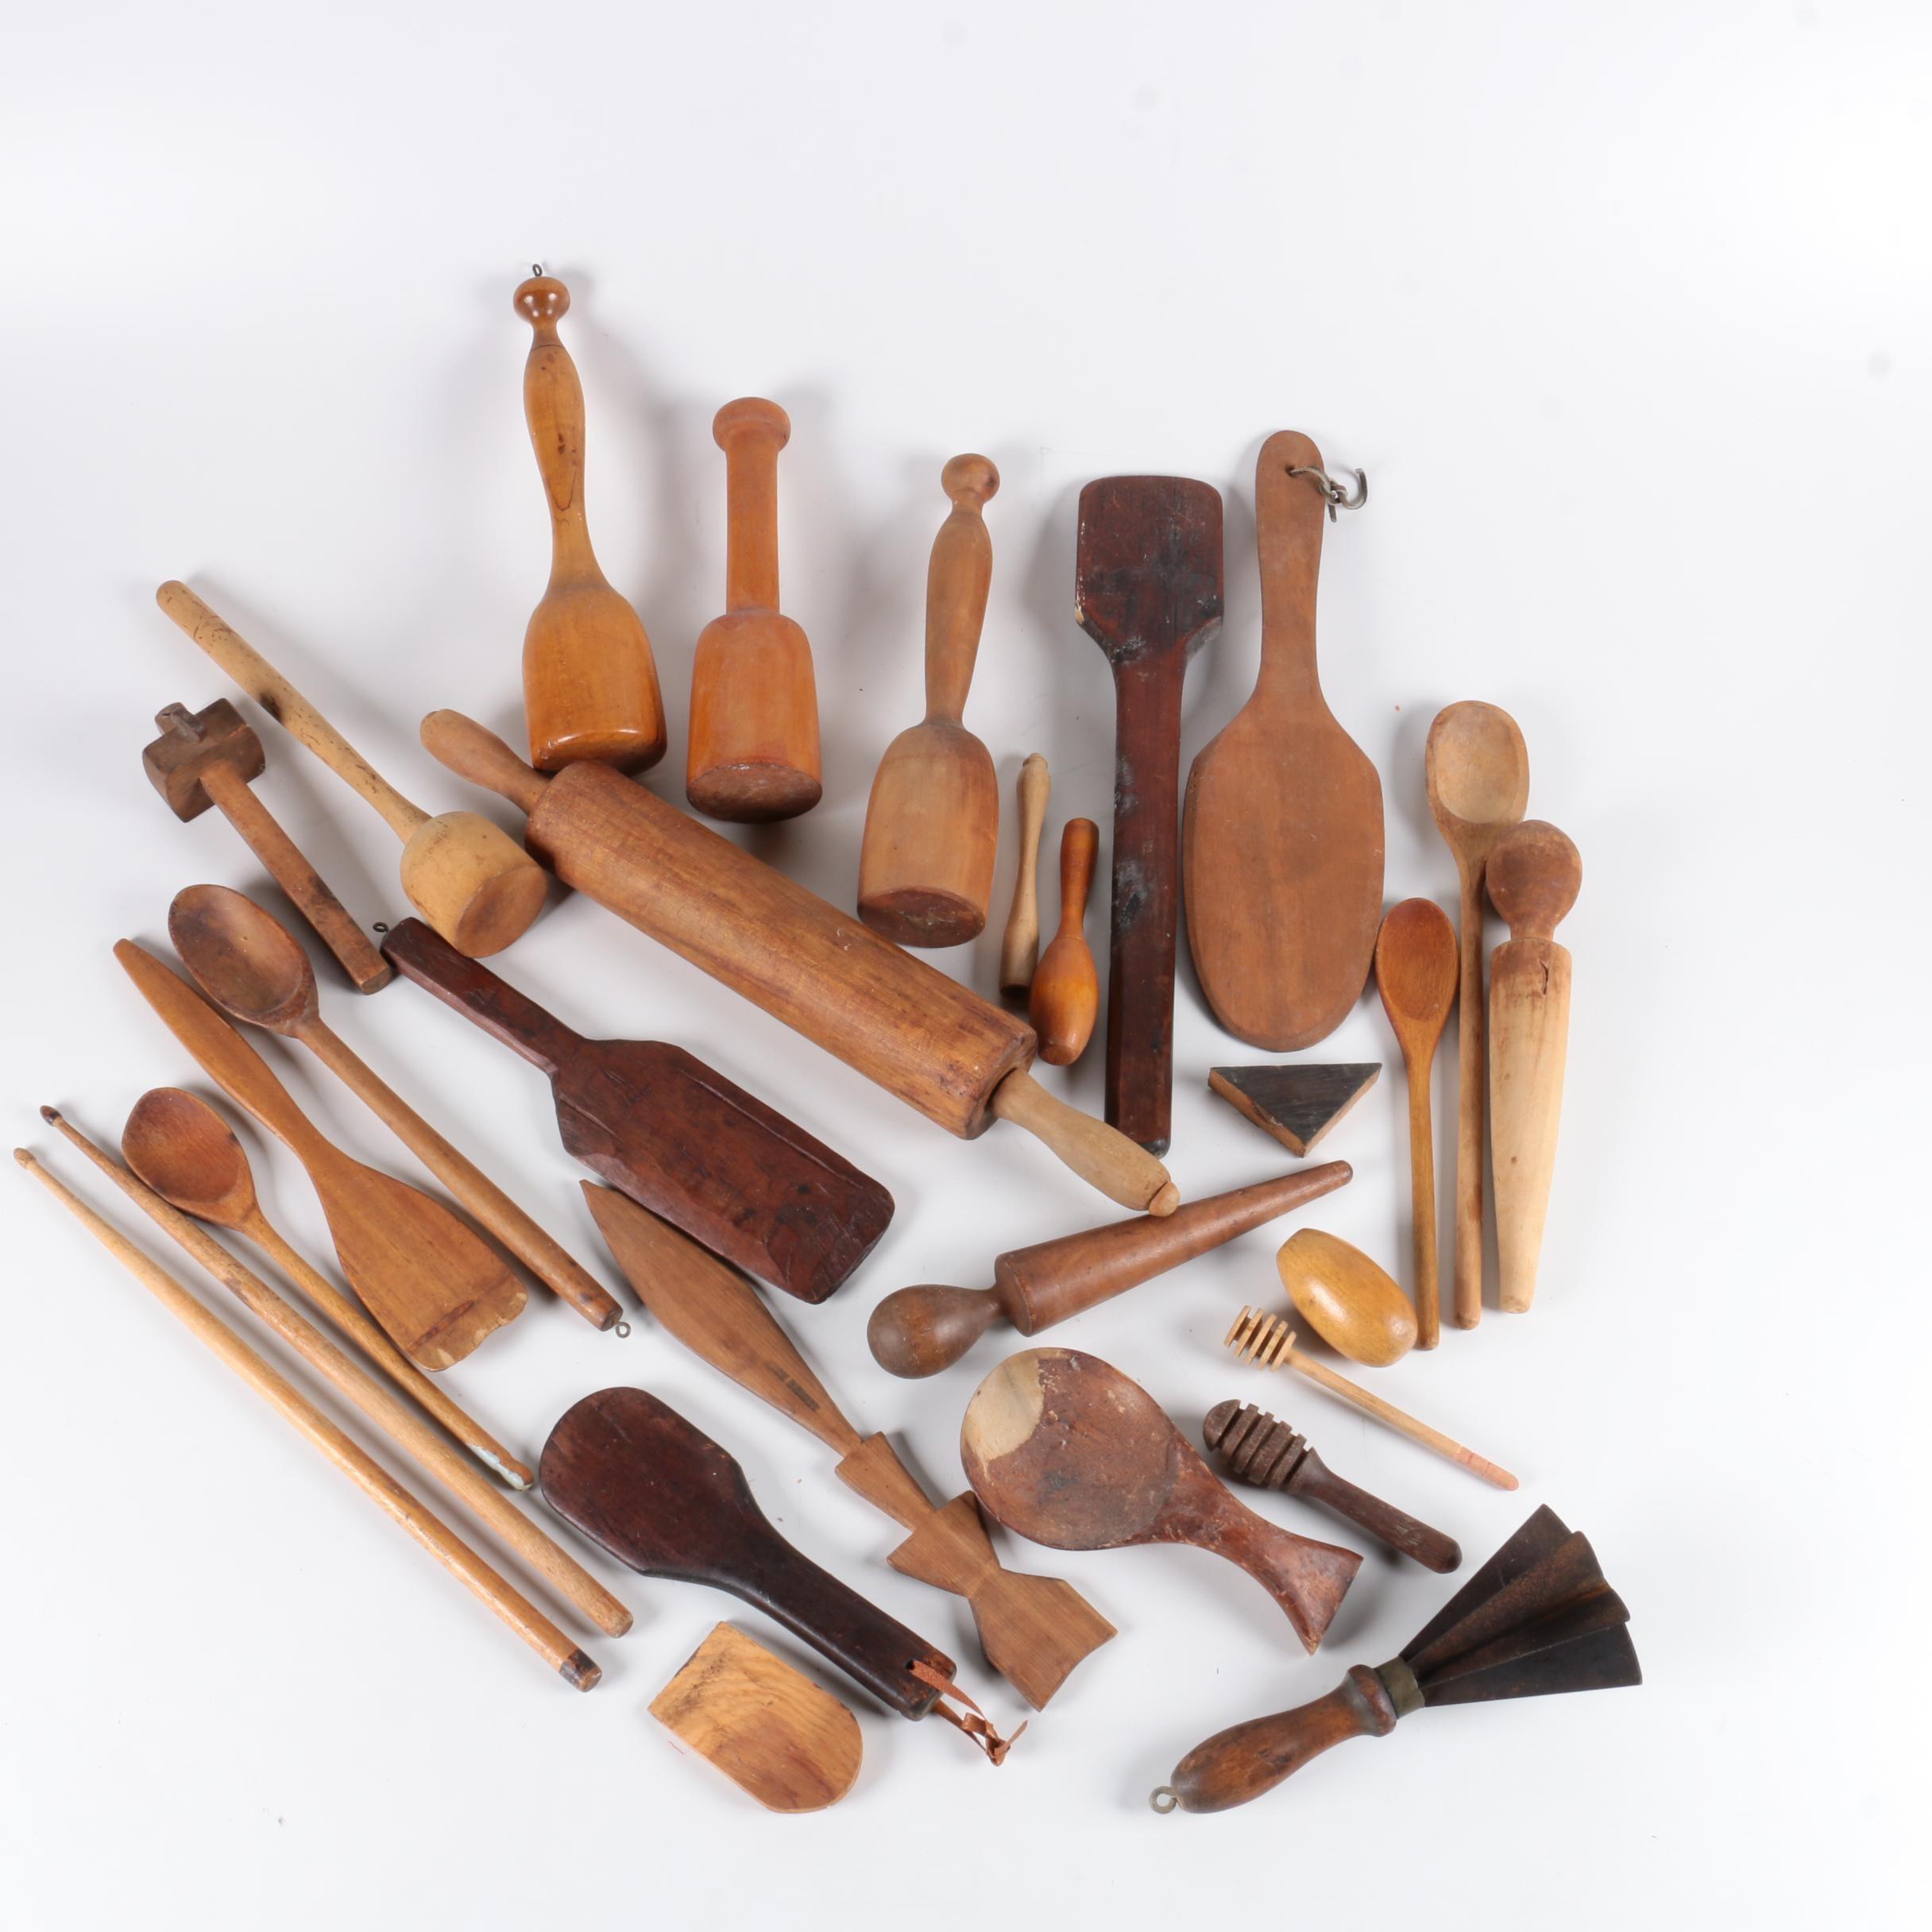 Vintage Wooden Kitchen Tools